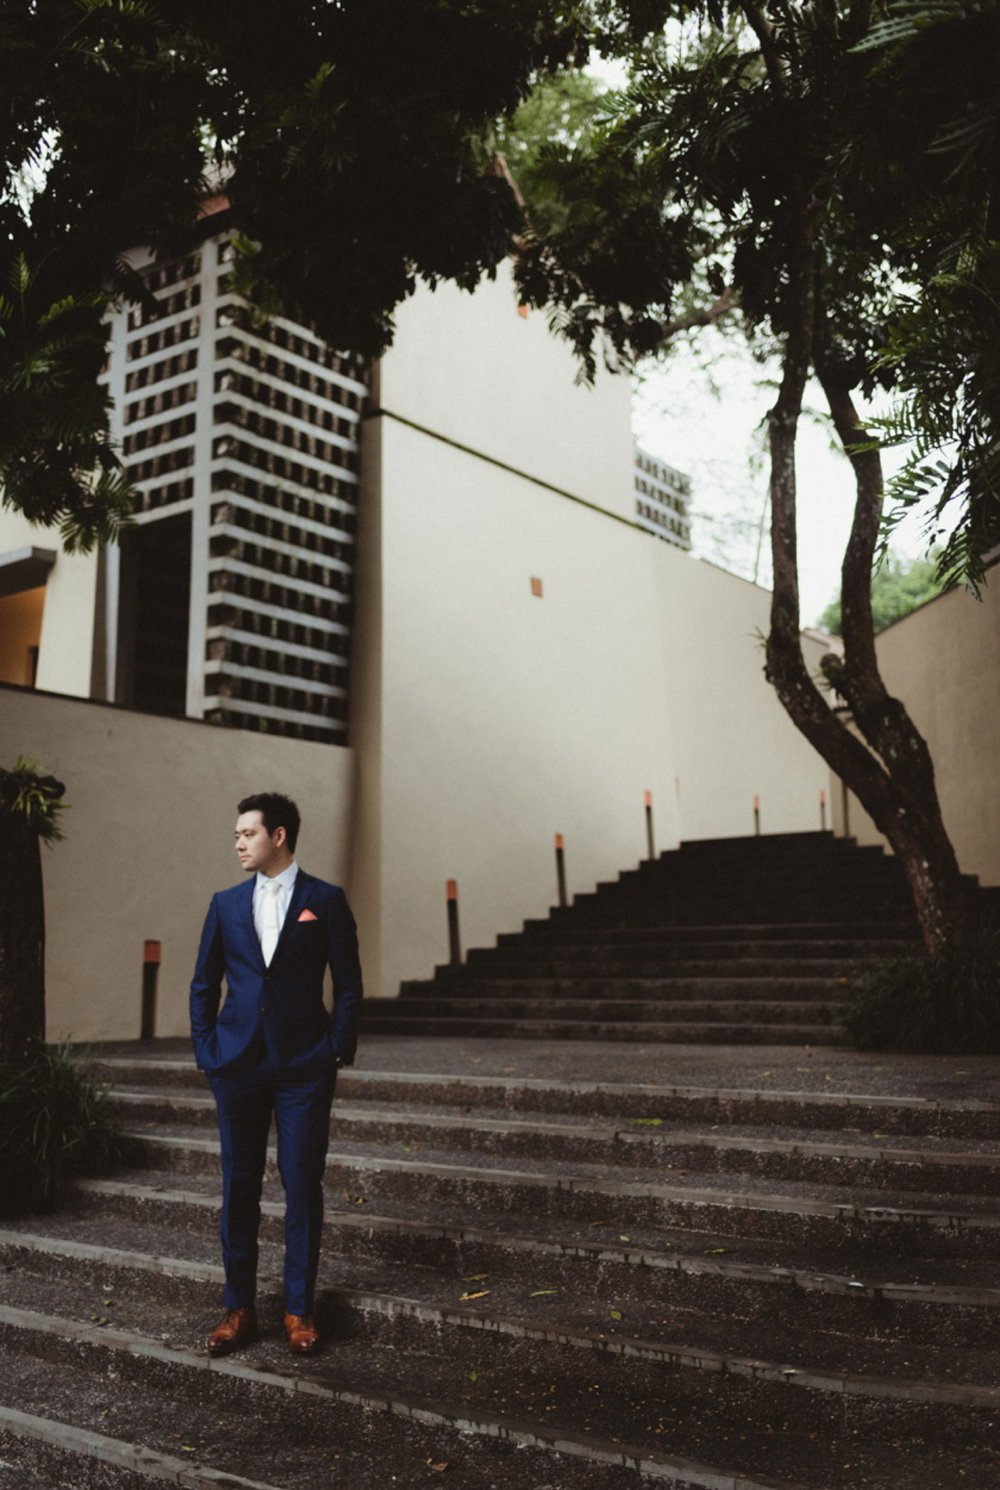 Tim-Danika-Bali-Wedding-Pyara-Photo-Evans 13.jpg